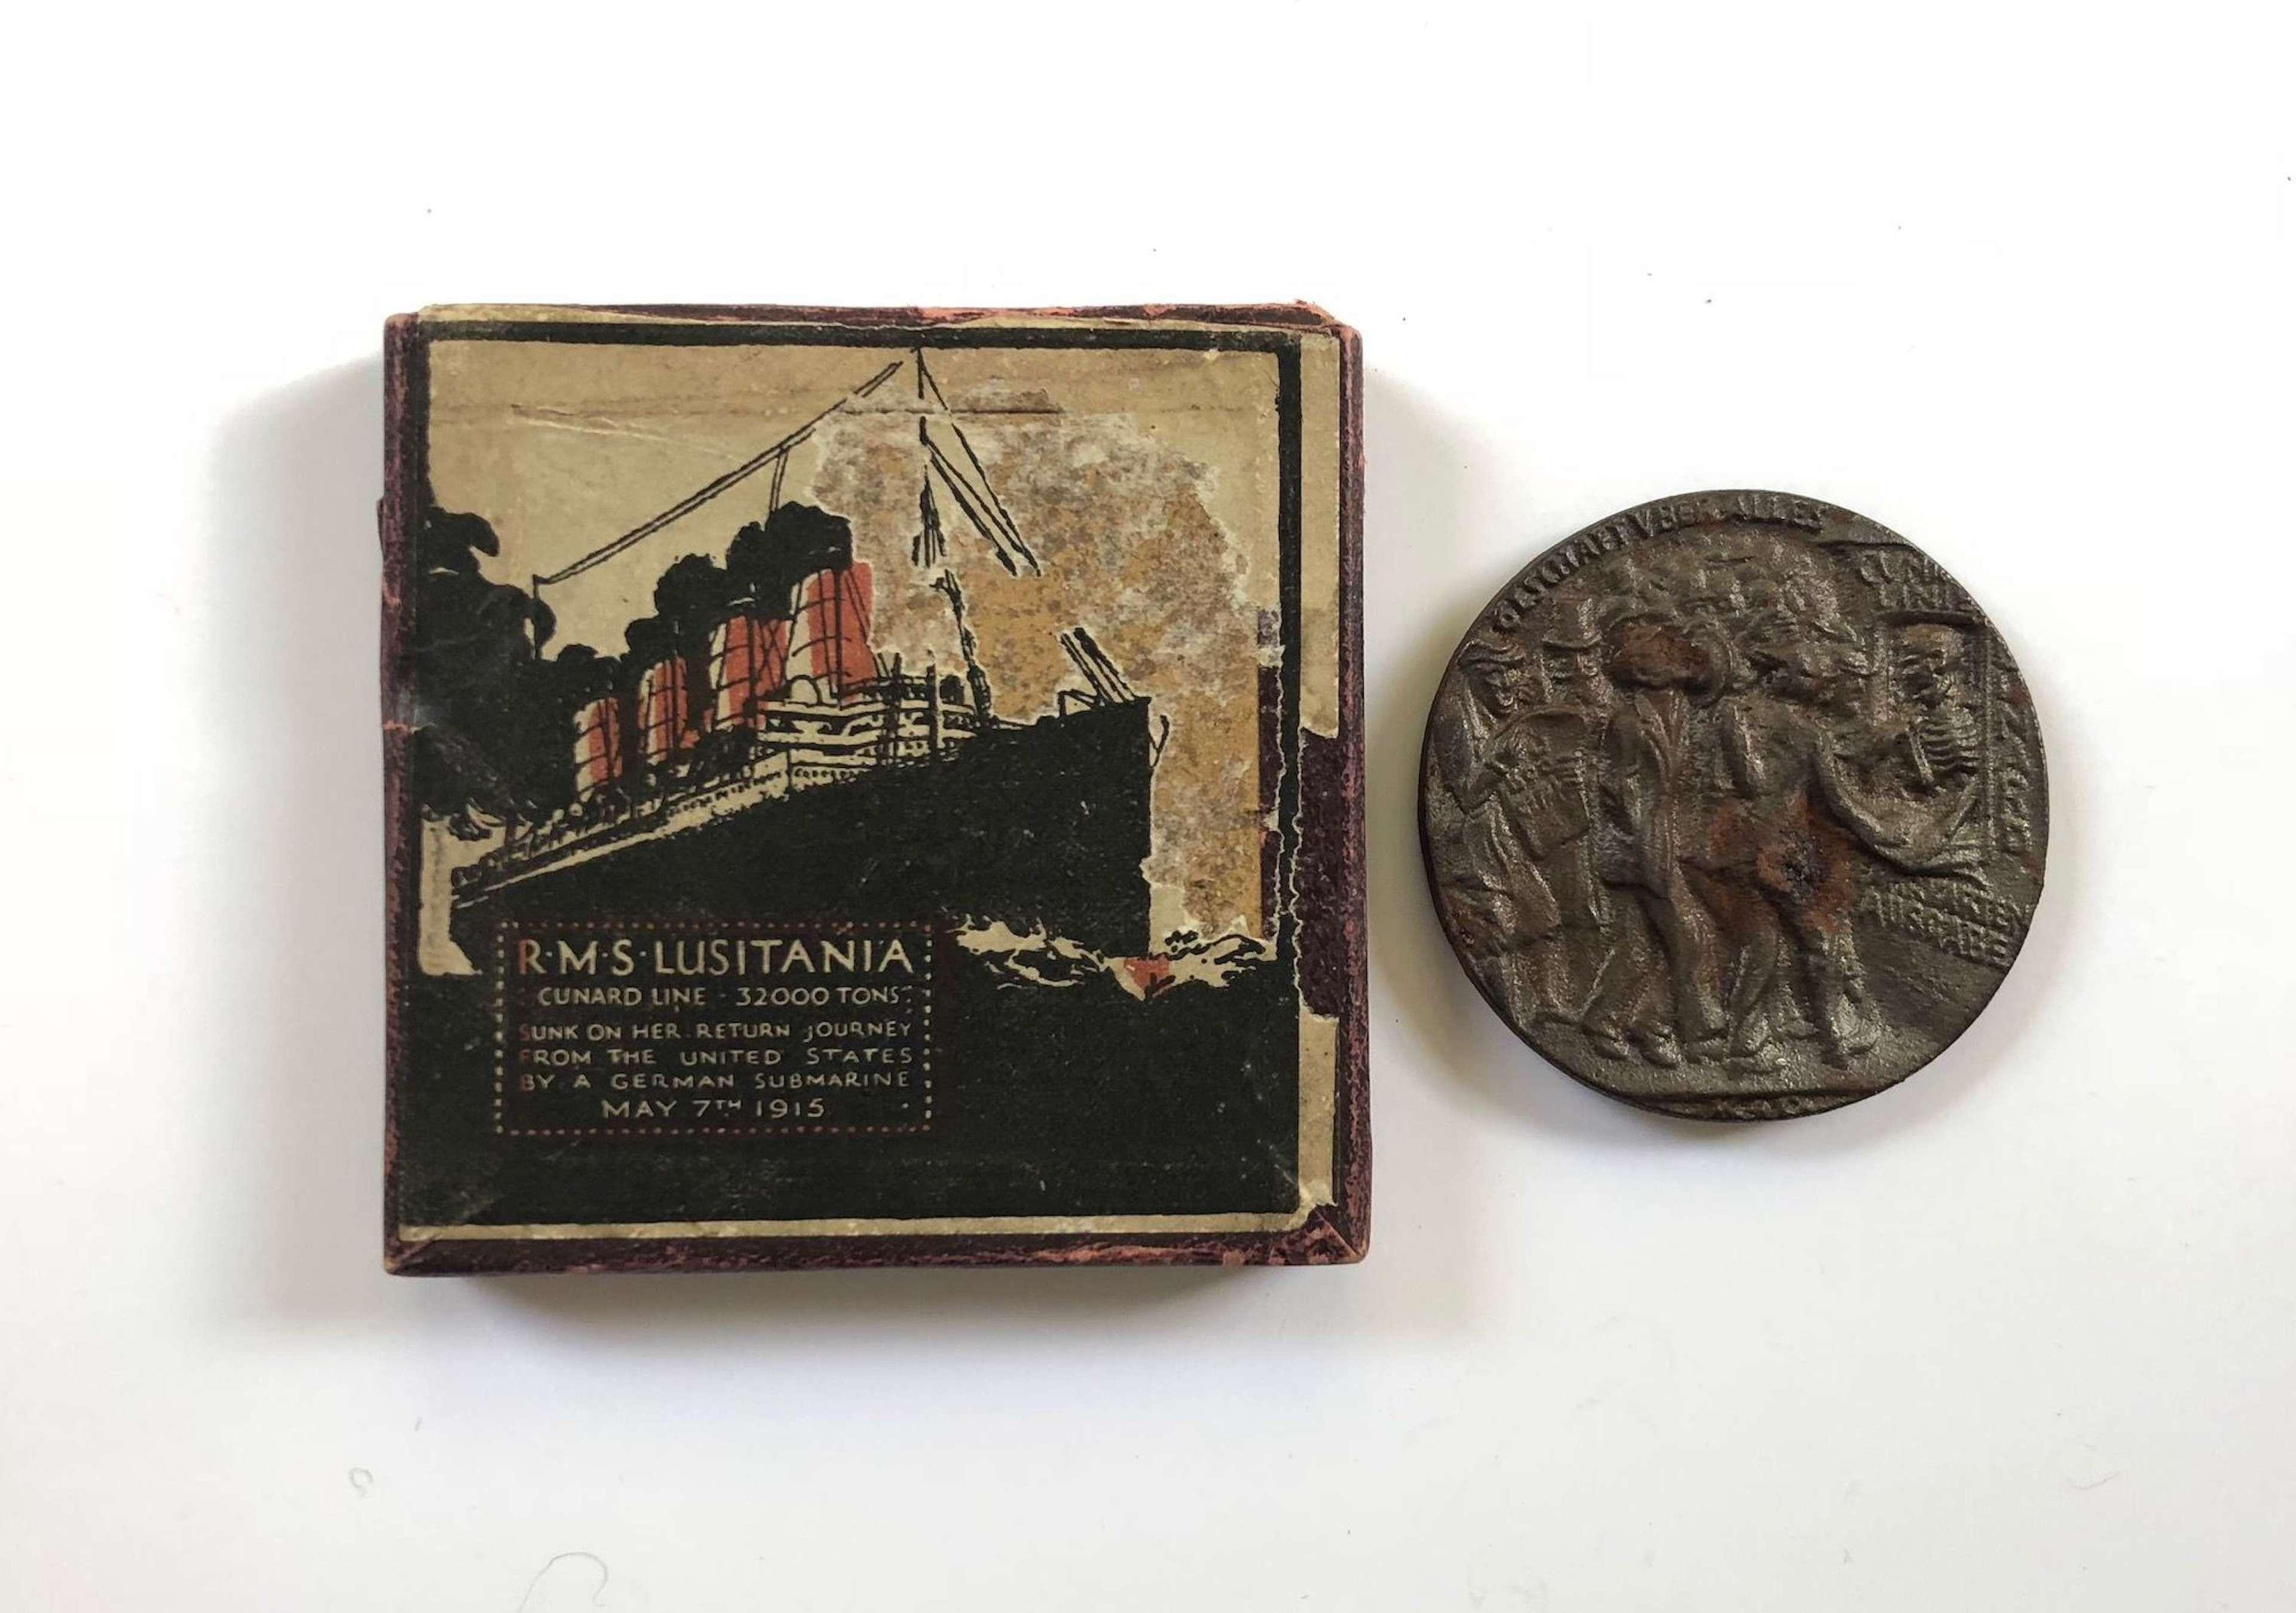 WW1 RMS Lusitania Cunard Shipping Line commemorative medal.